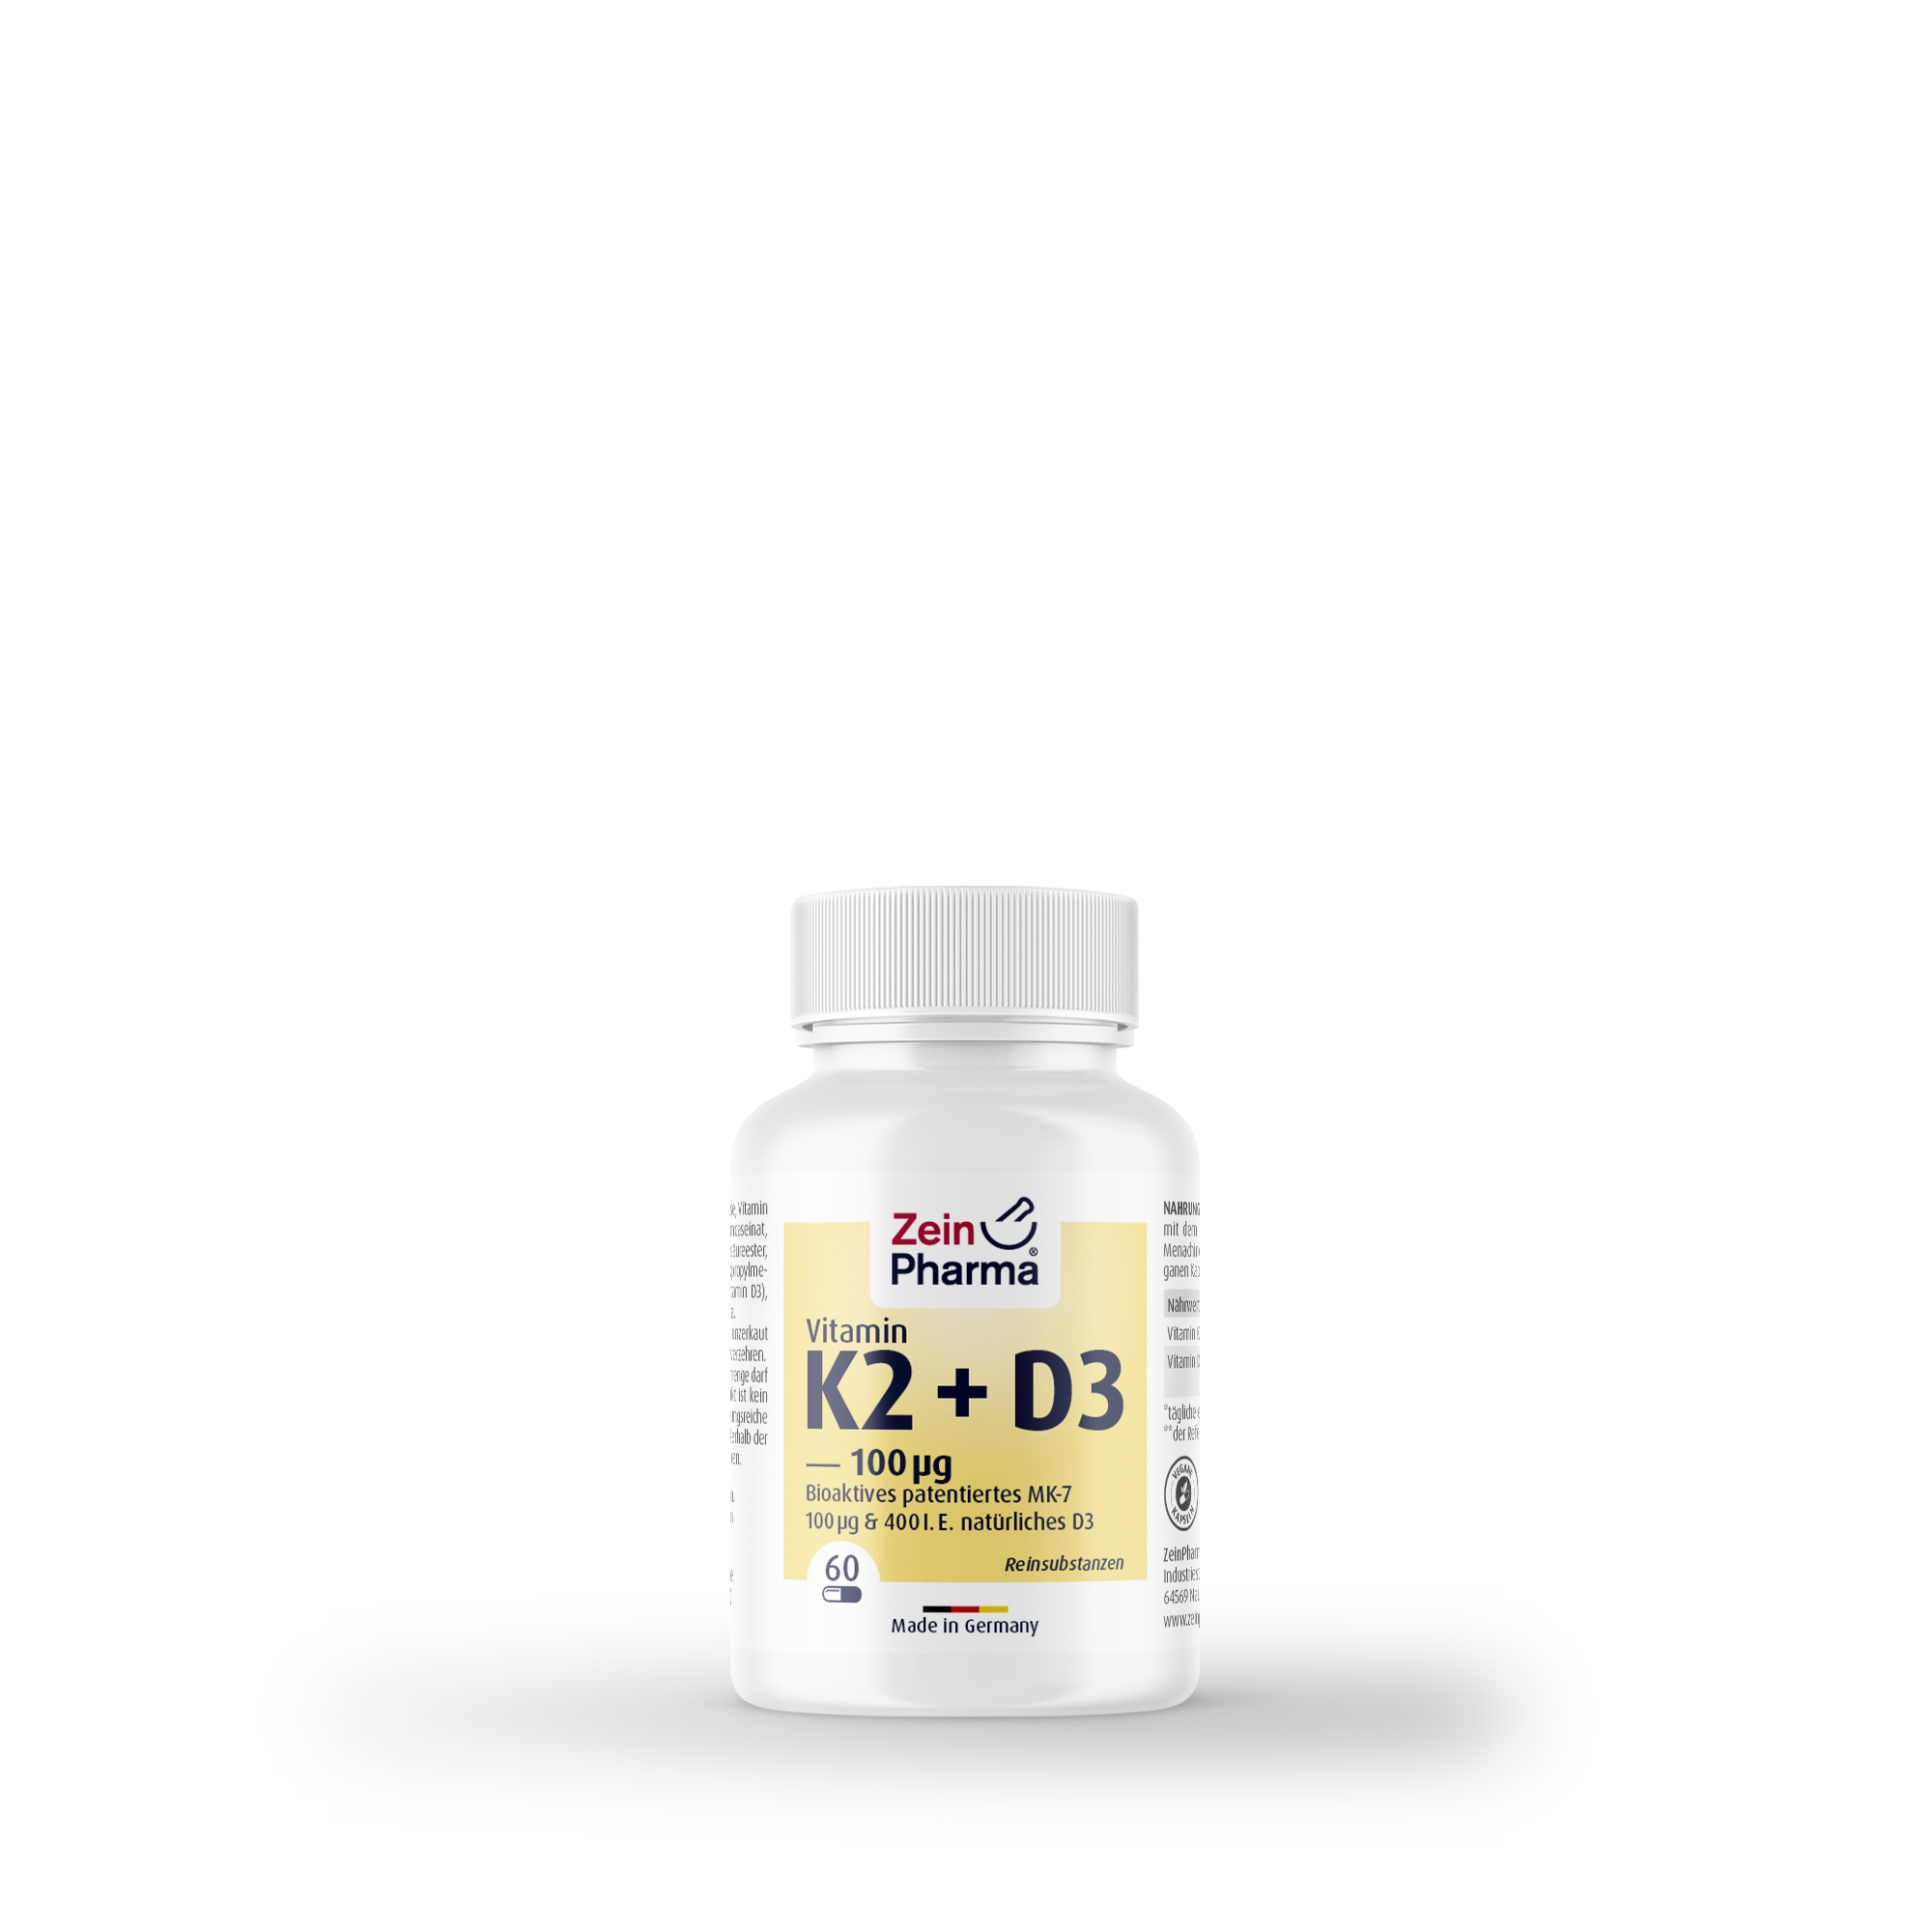 Vitamin K2 + D3 100 µg